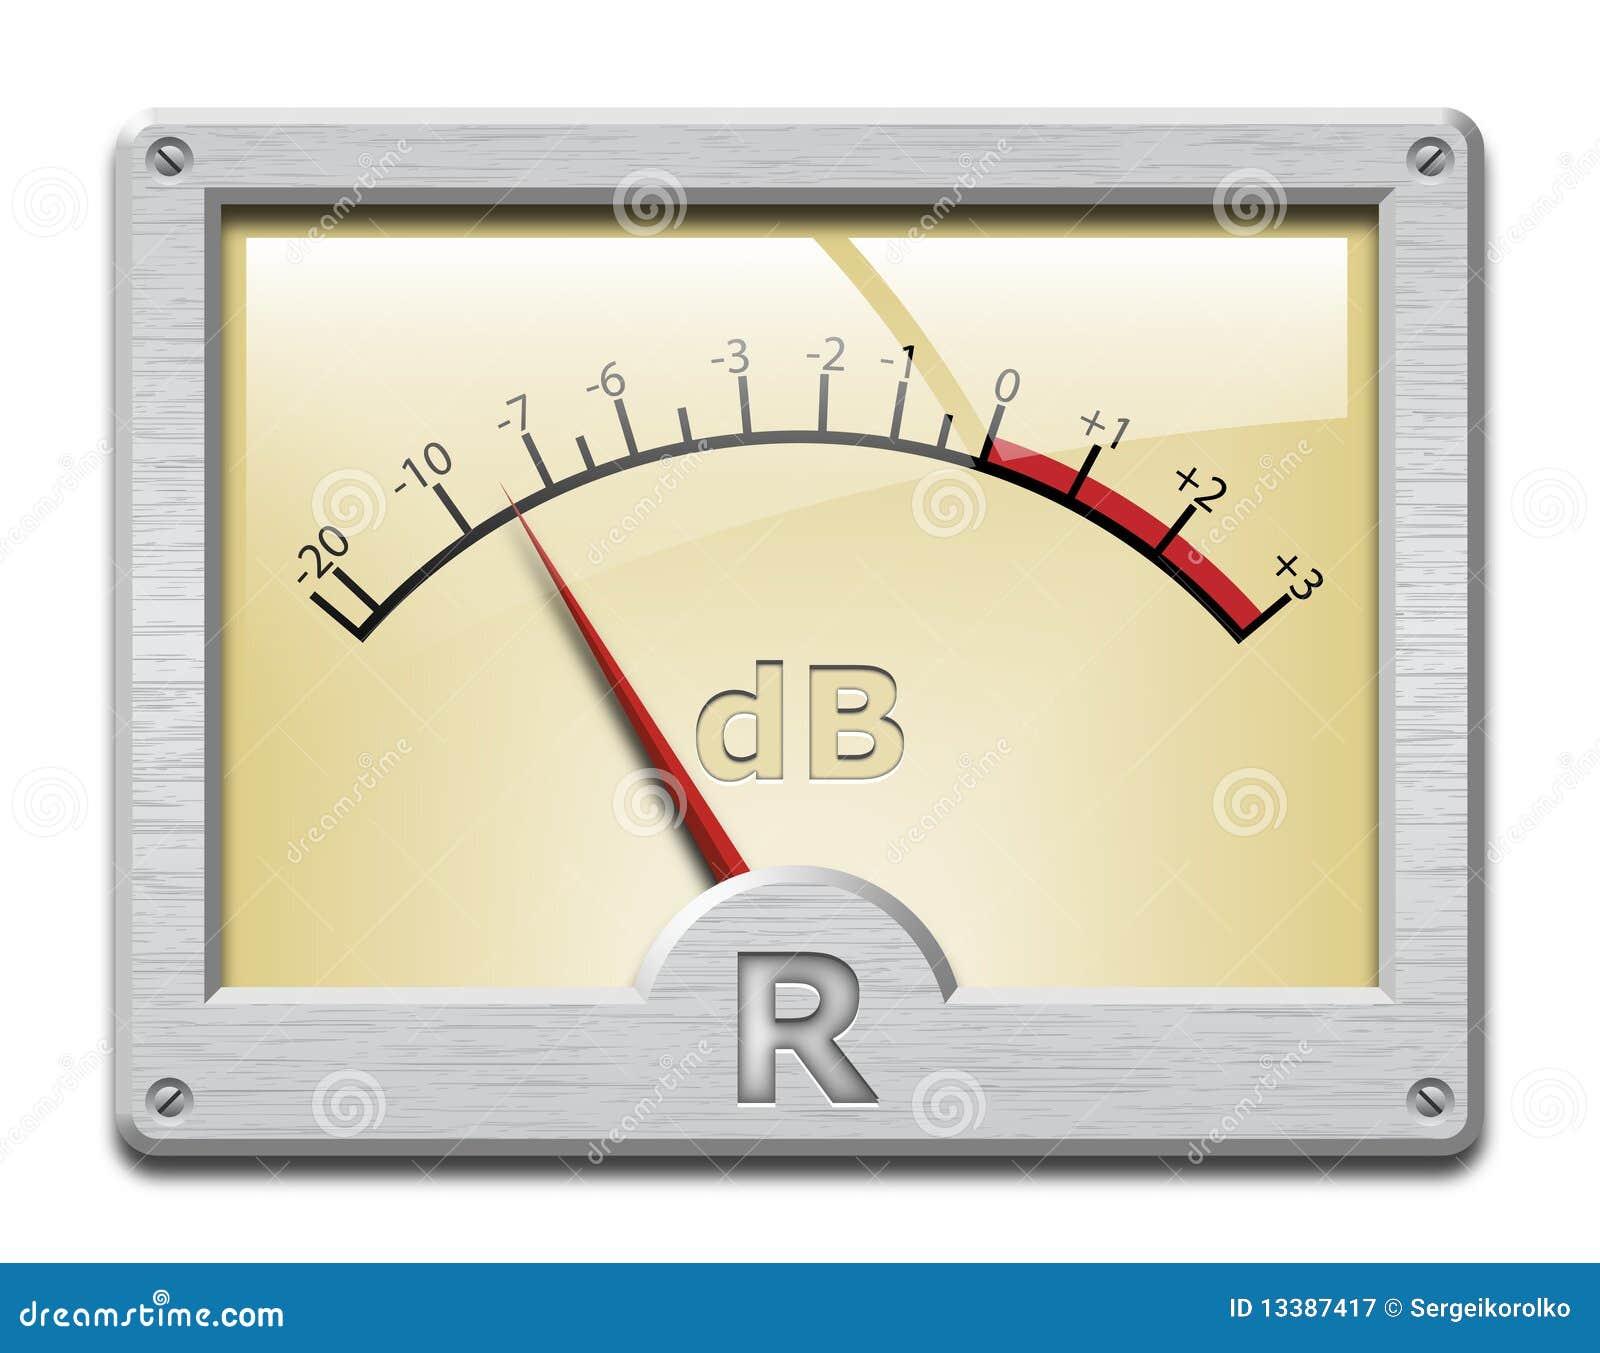 Analog Meter Background : Analog signal meter on white background royalty free stock